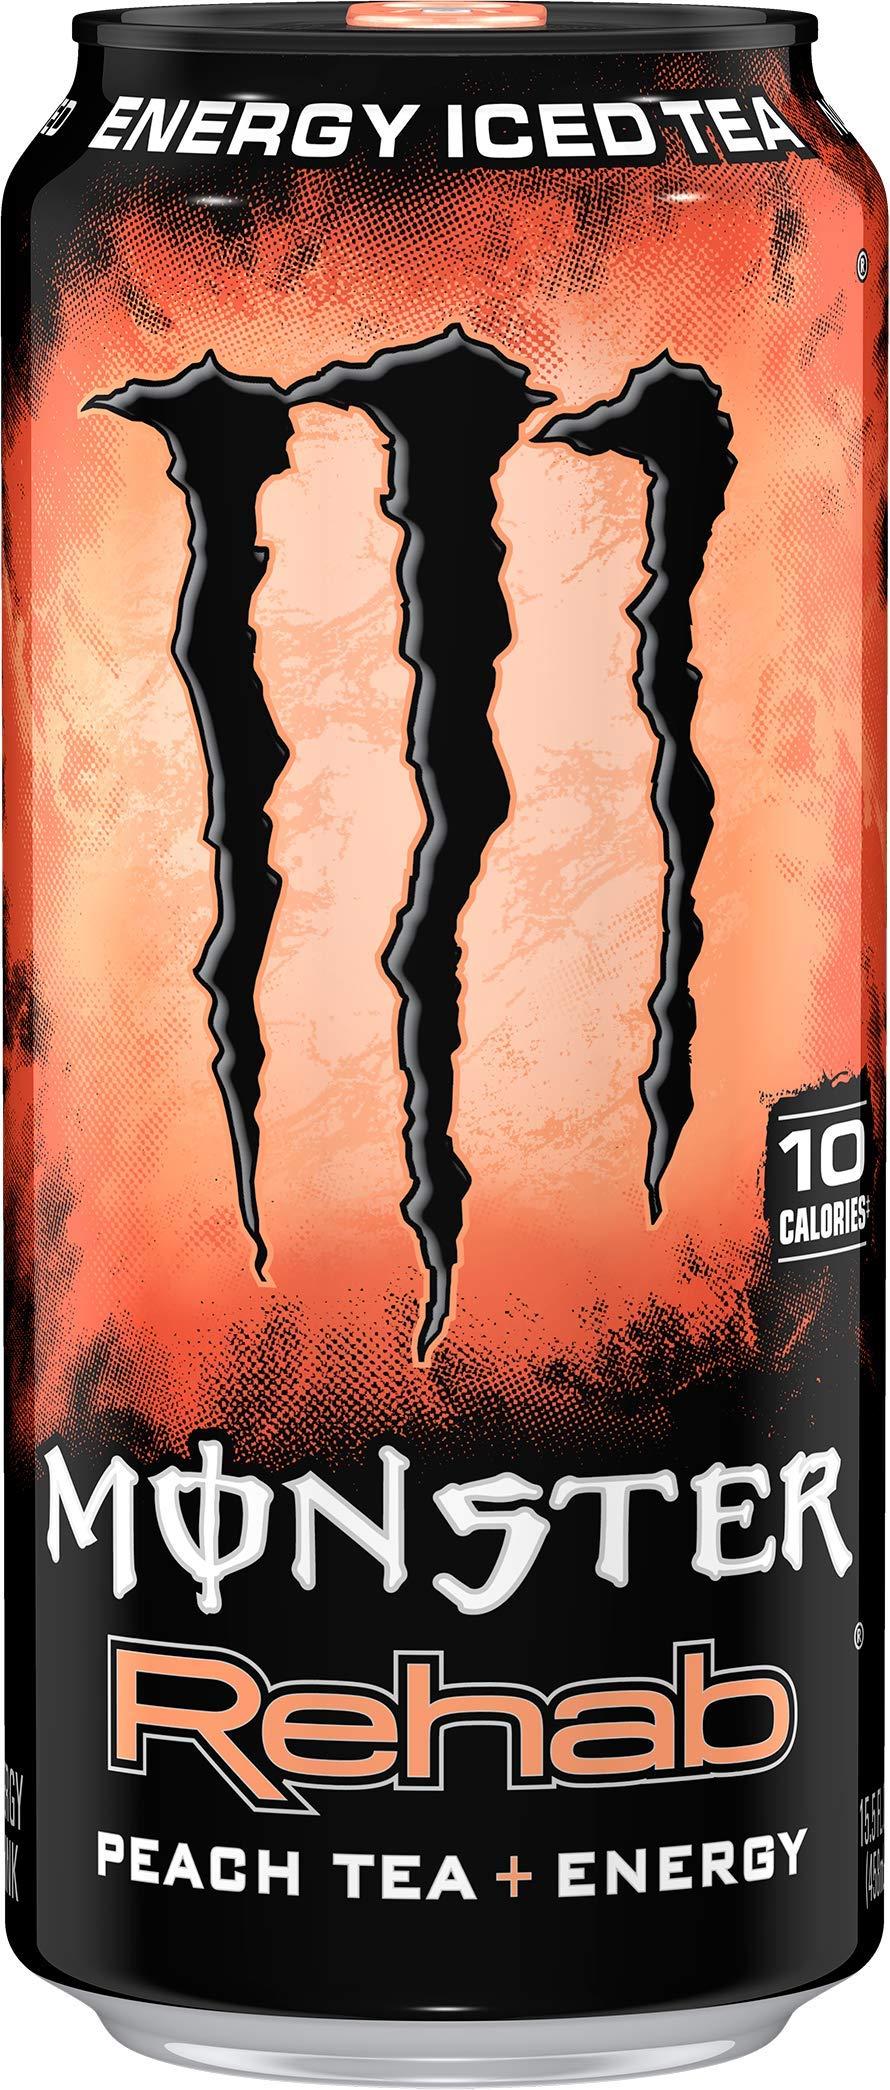 Monster Rehab Peach Tea + Energy, Energy Iced Tea, 15.5 Ounce (Pack of 24) by Monster Energy (Image #3)